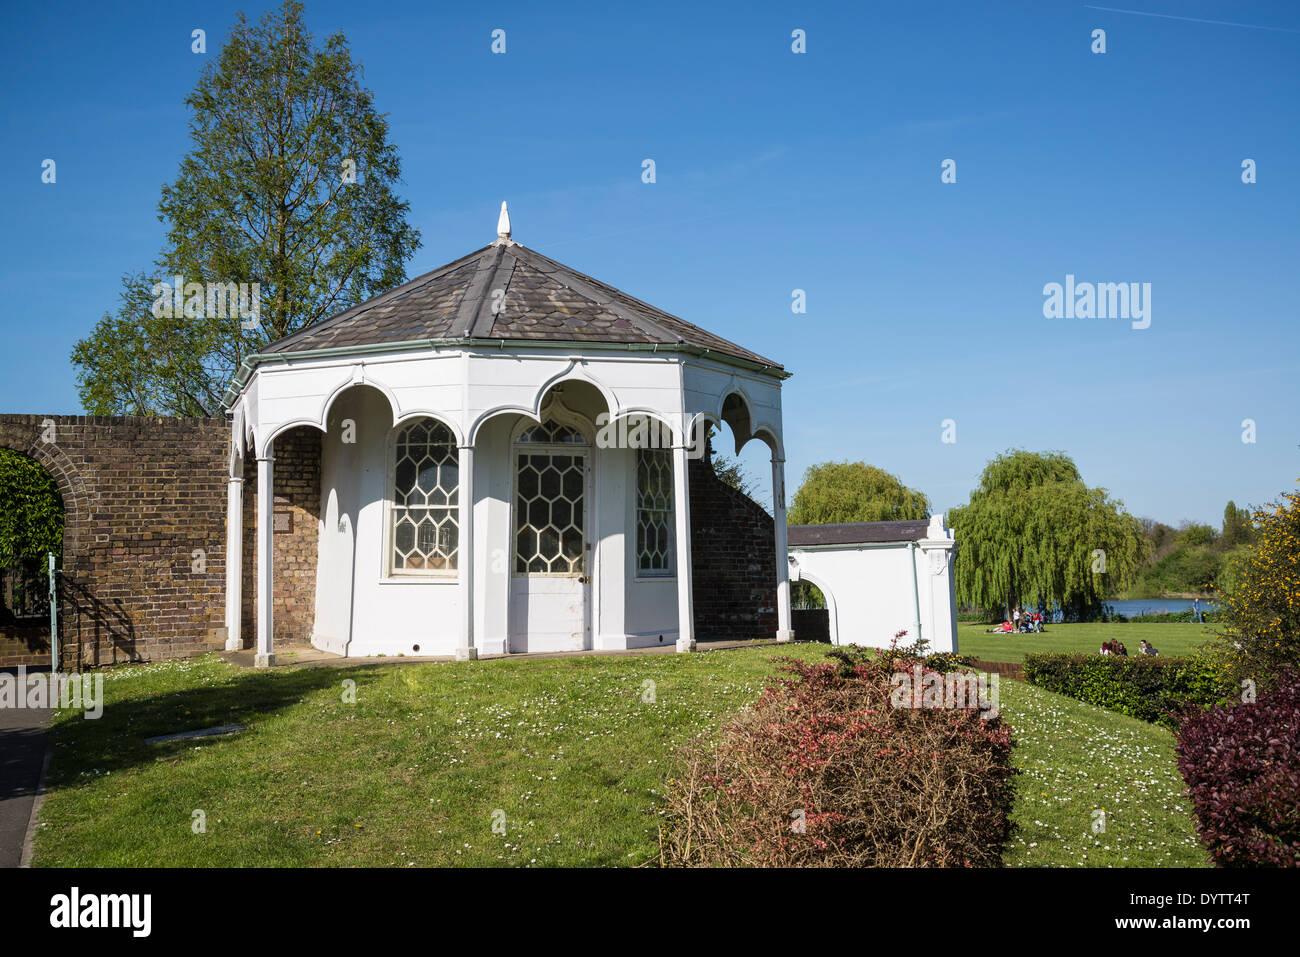 Radnor Gardens Pavilion, Strawberry Hill, Borough of Richmond, London, UK - Stock Image